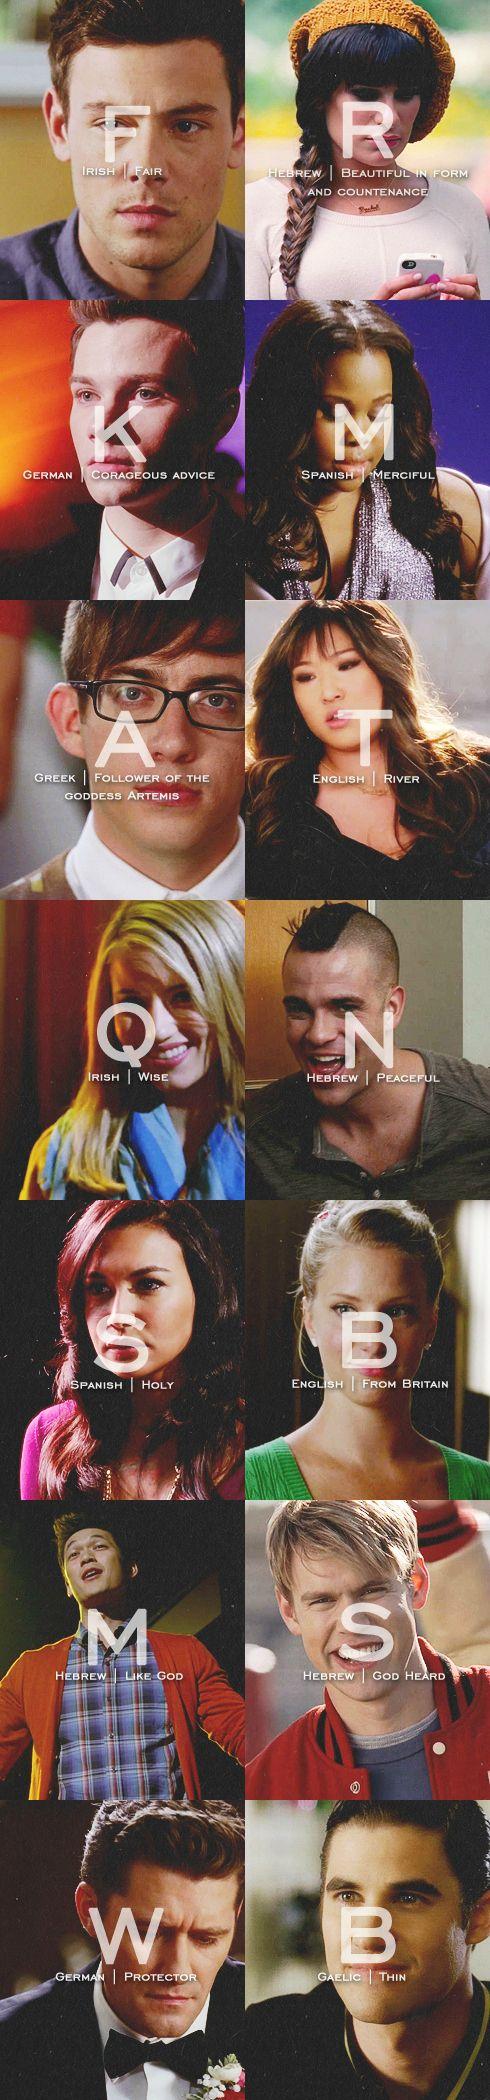 Glee Cast | Billboard